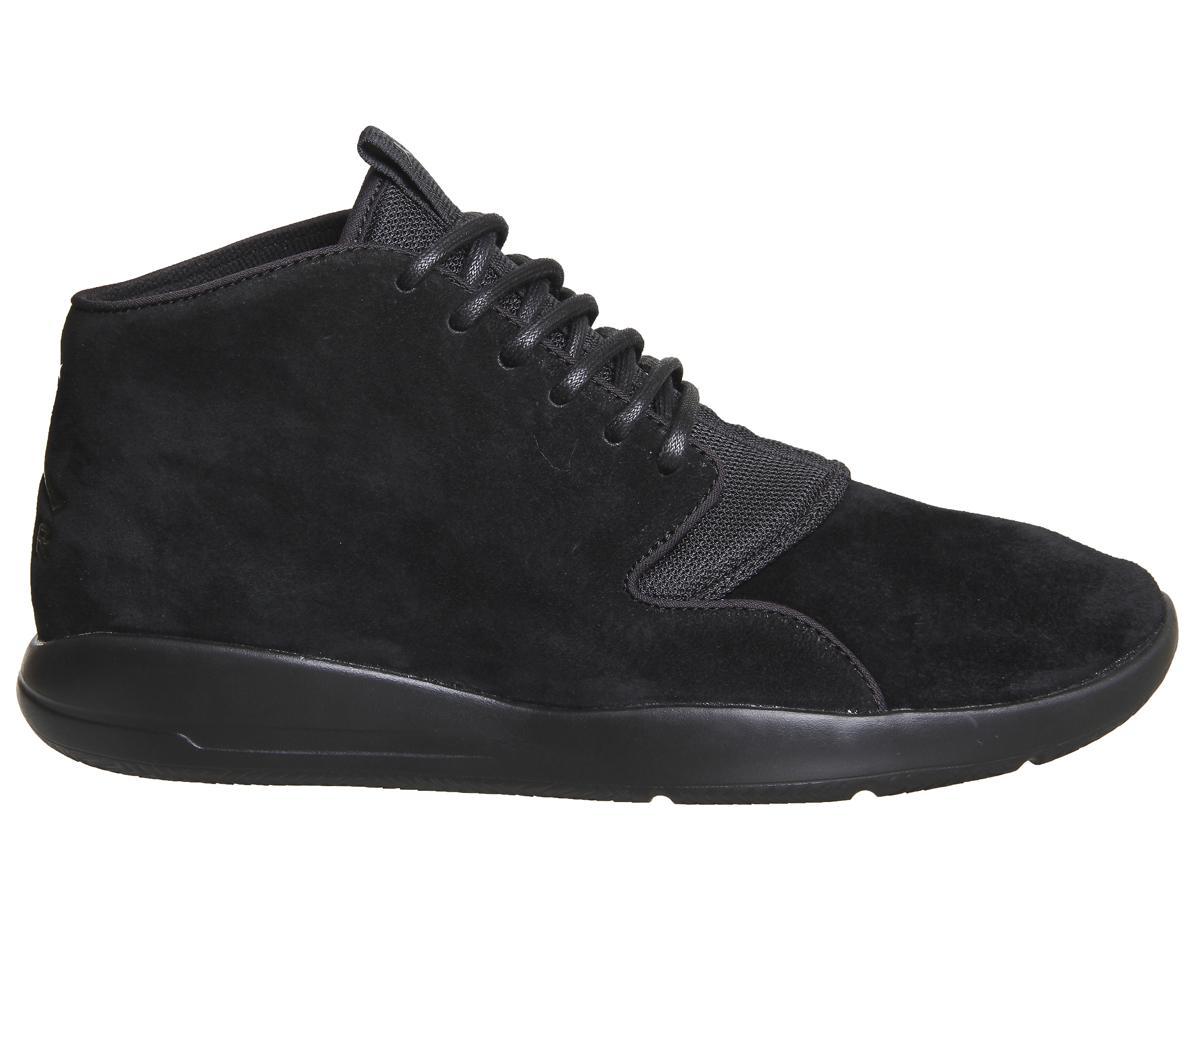 best sneakers 36afb 60916 Nike Jordan Eclipse Chukka Lea Trainers in Black for Men - Lyst